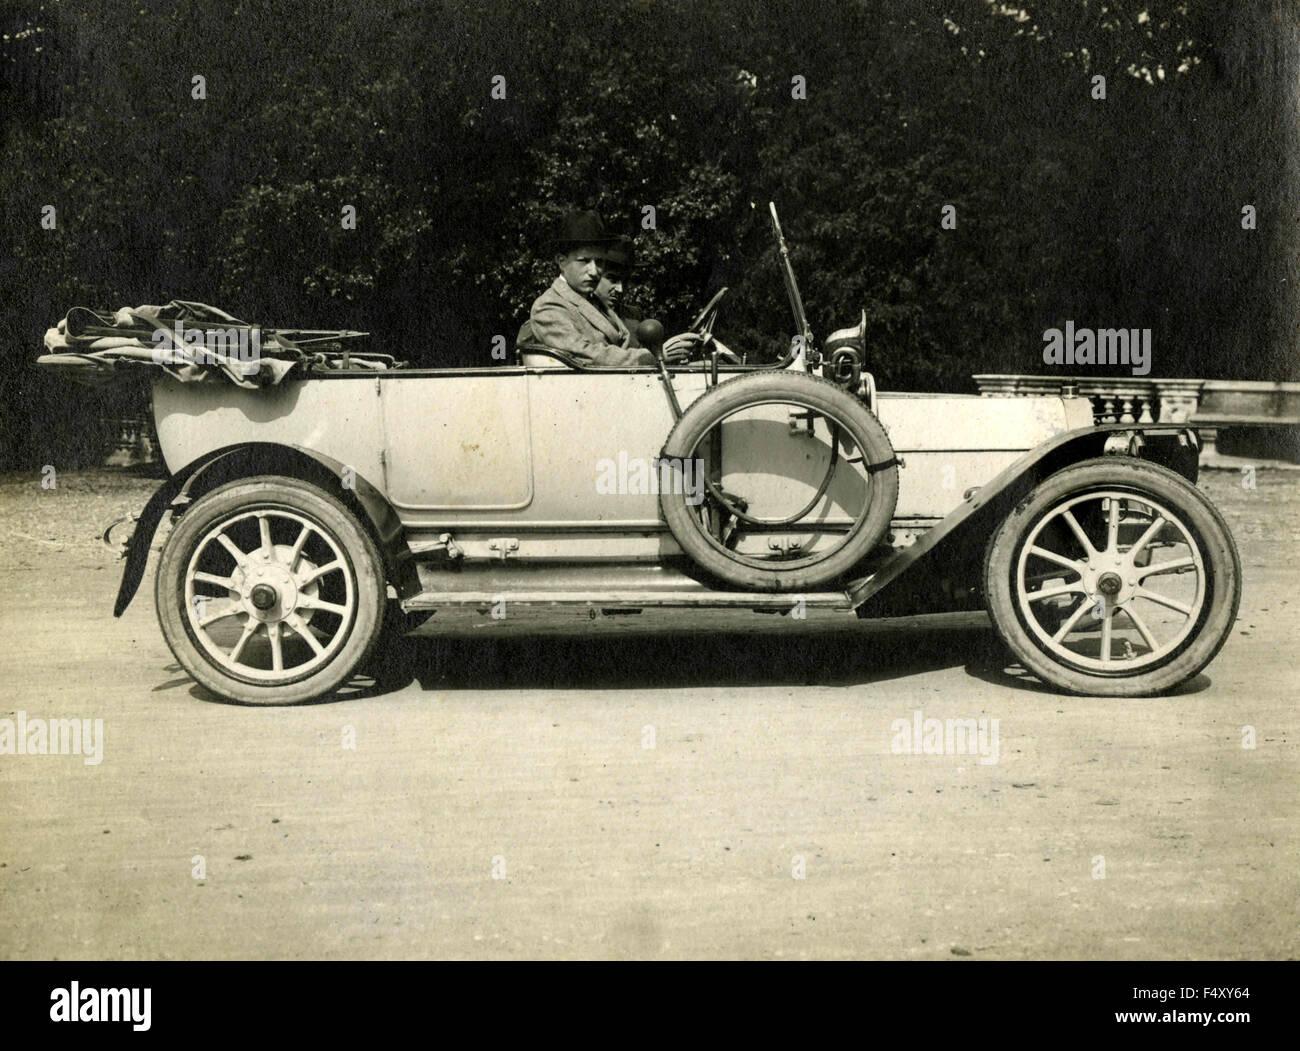 White car cabrio 10s, Italy - Stock Image